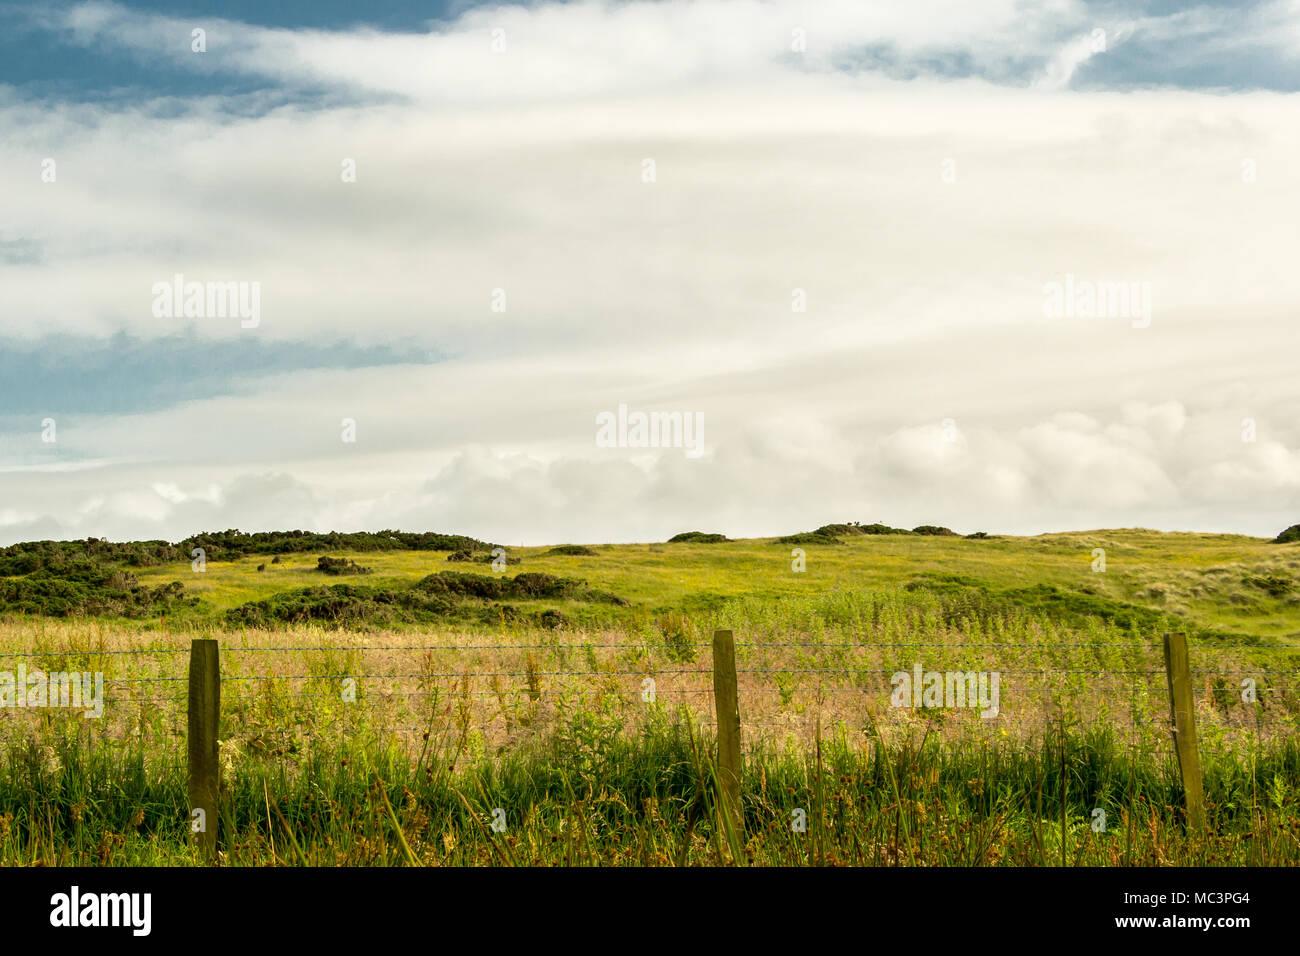 Hills of pastureland beyond an overgrown field near the Giants Causeway, Northern Ireland - Stock Image